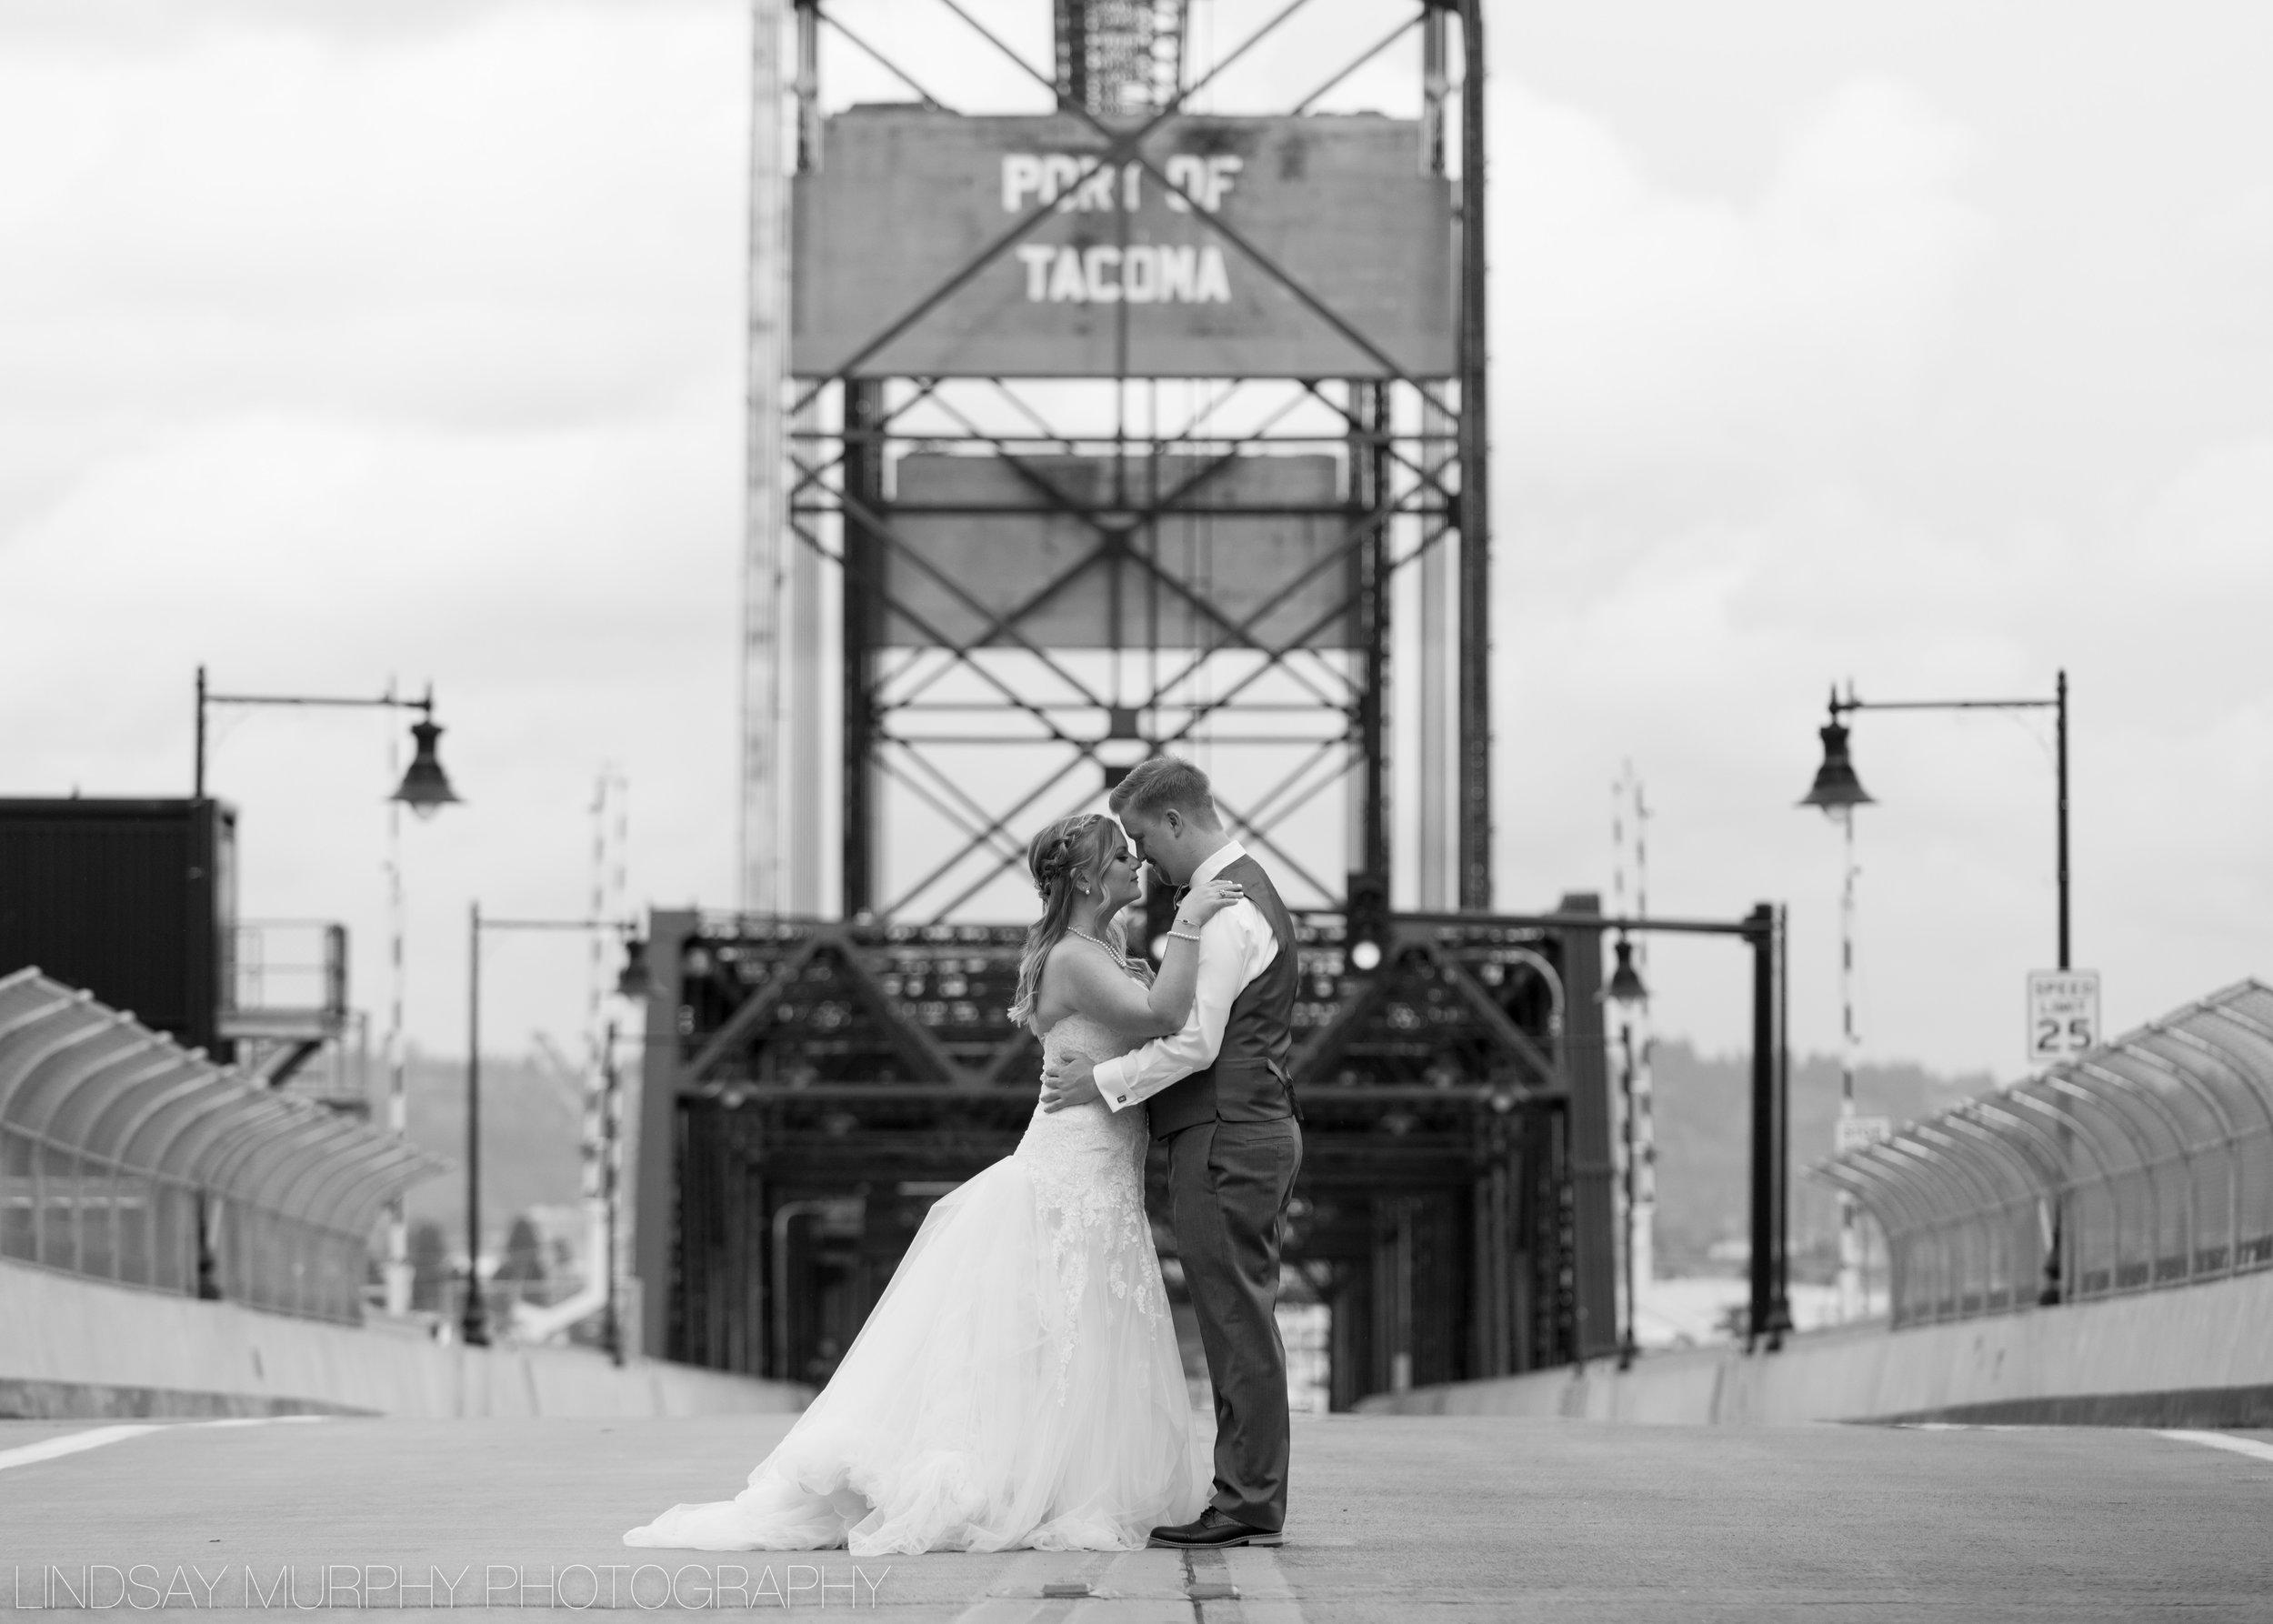 Tacoma_Wedding_photography-67.jpg